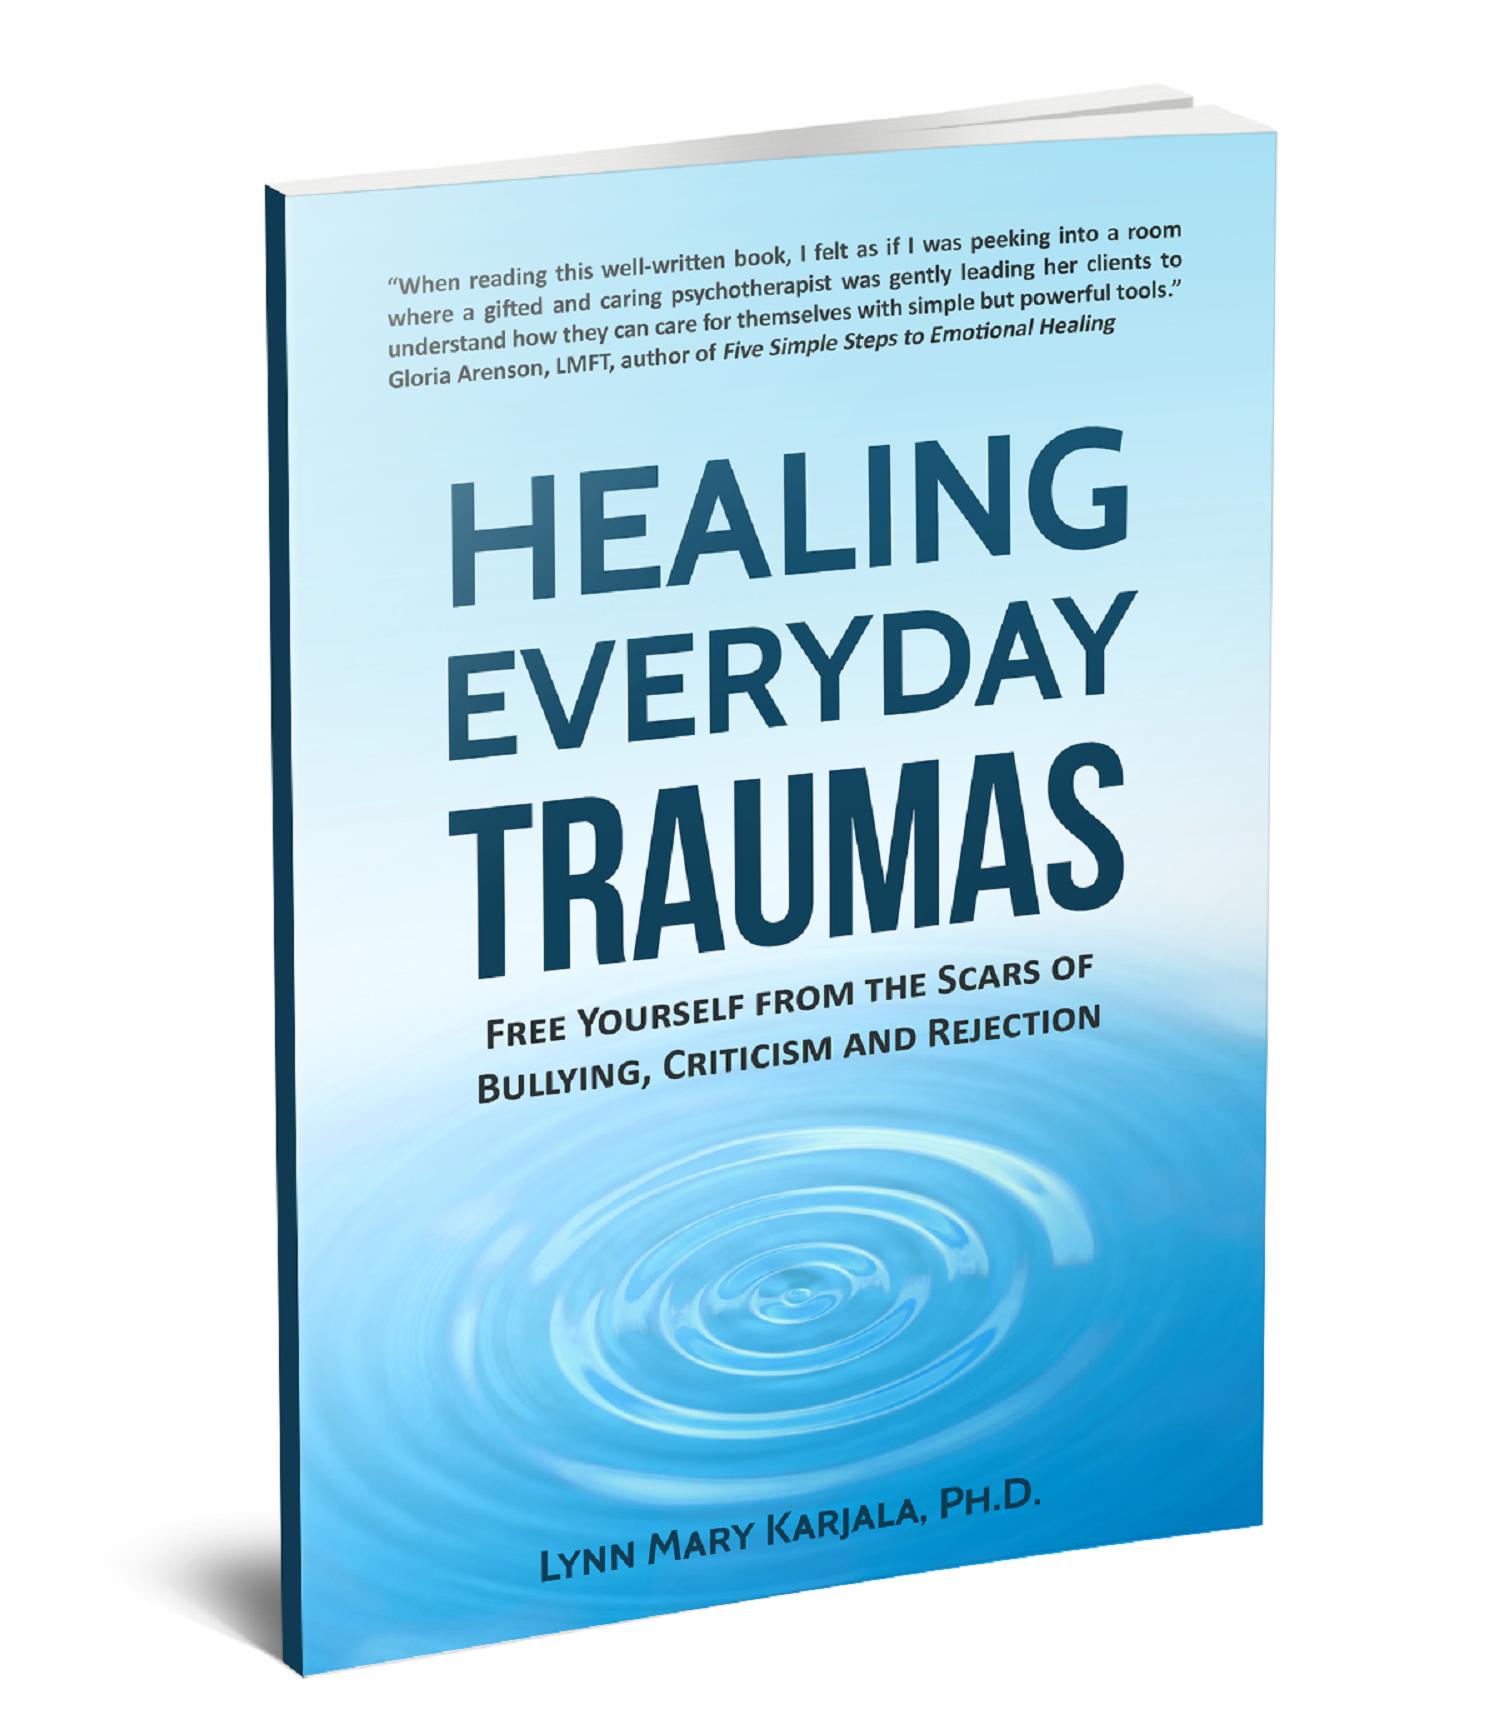 Healing Everyday Traumas